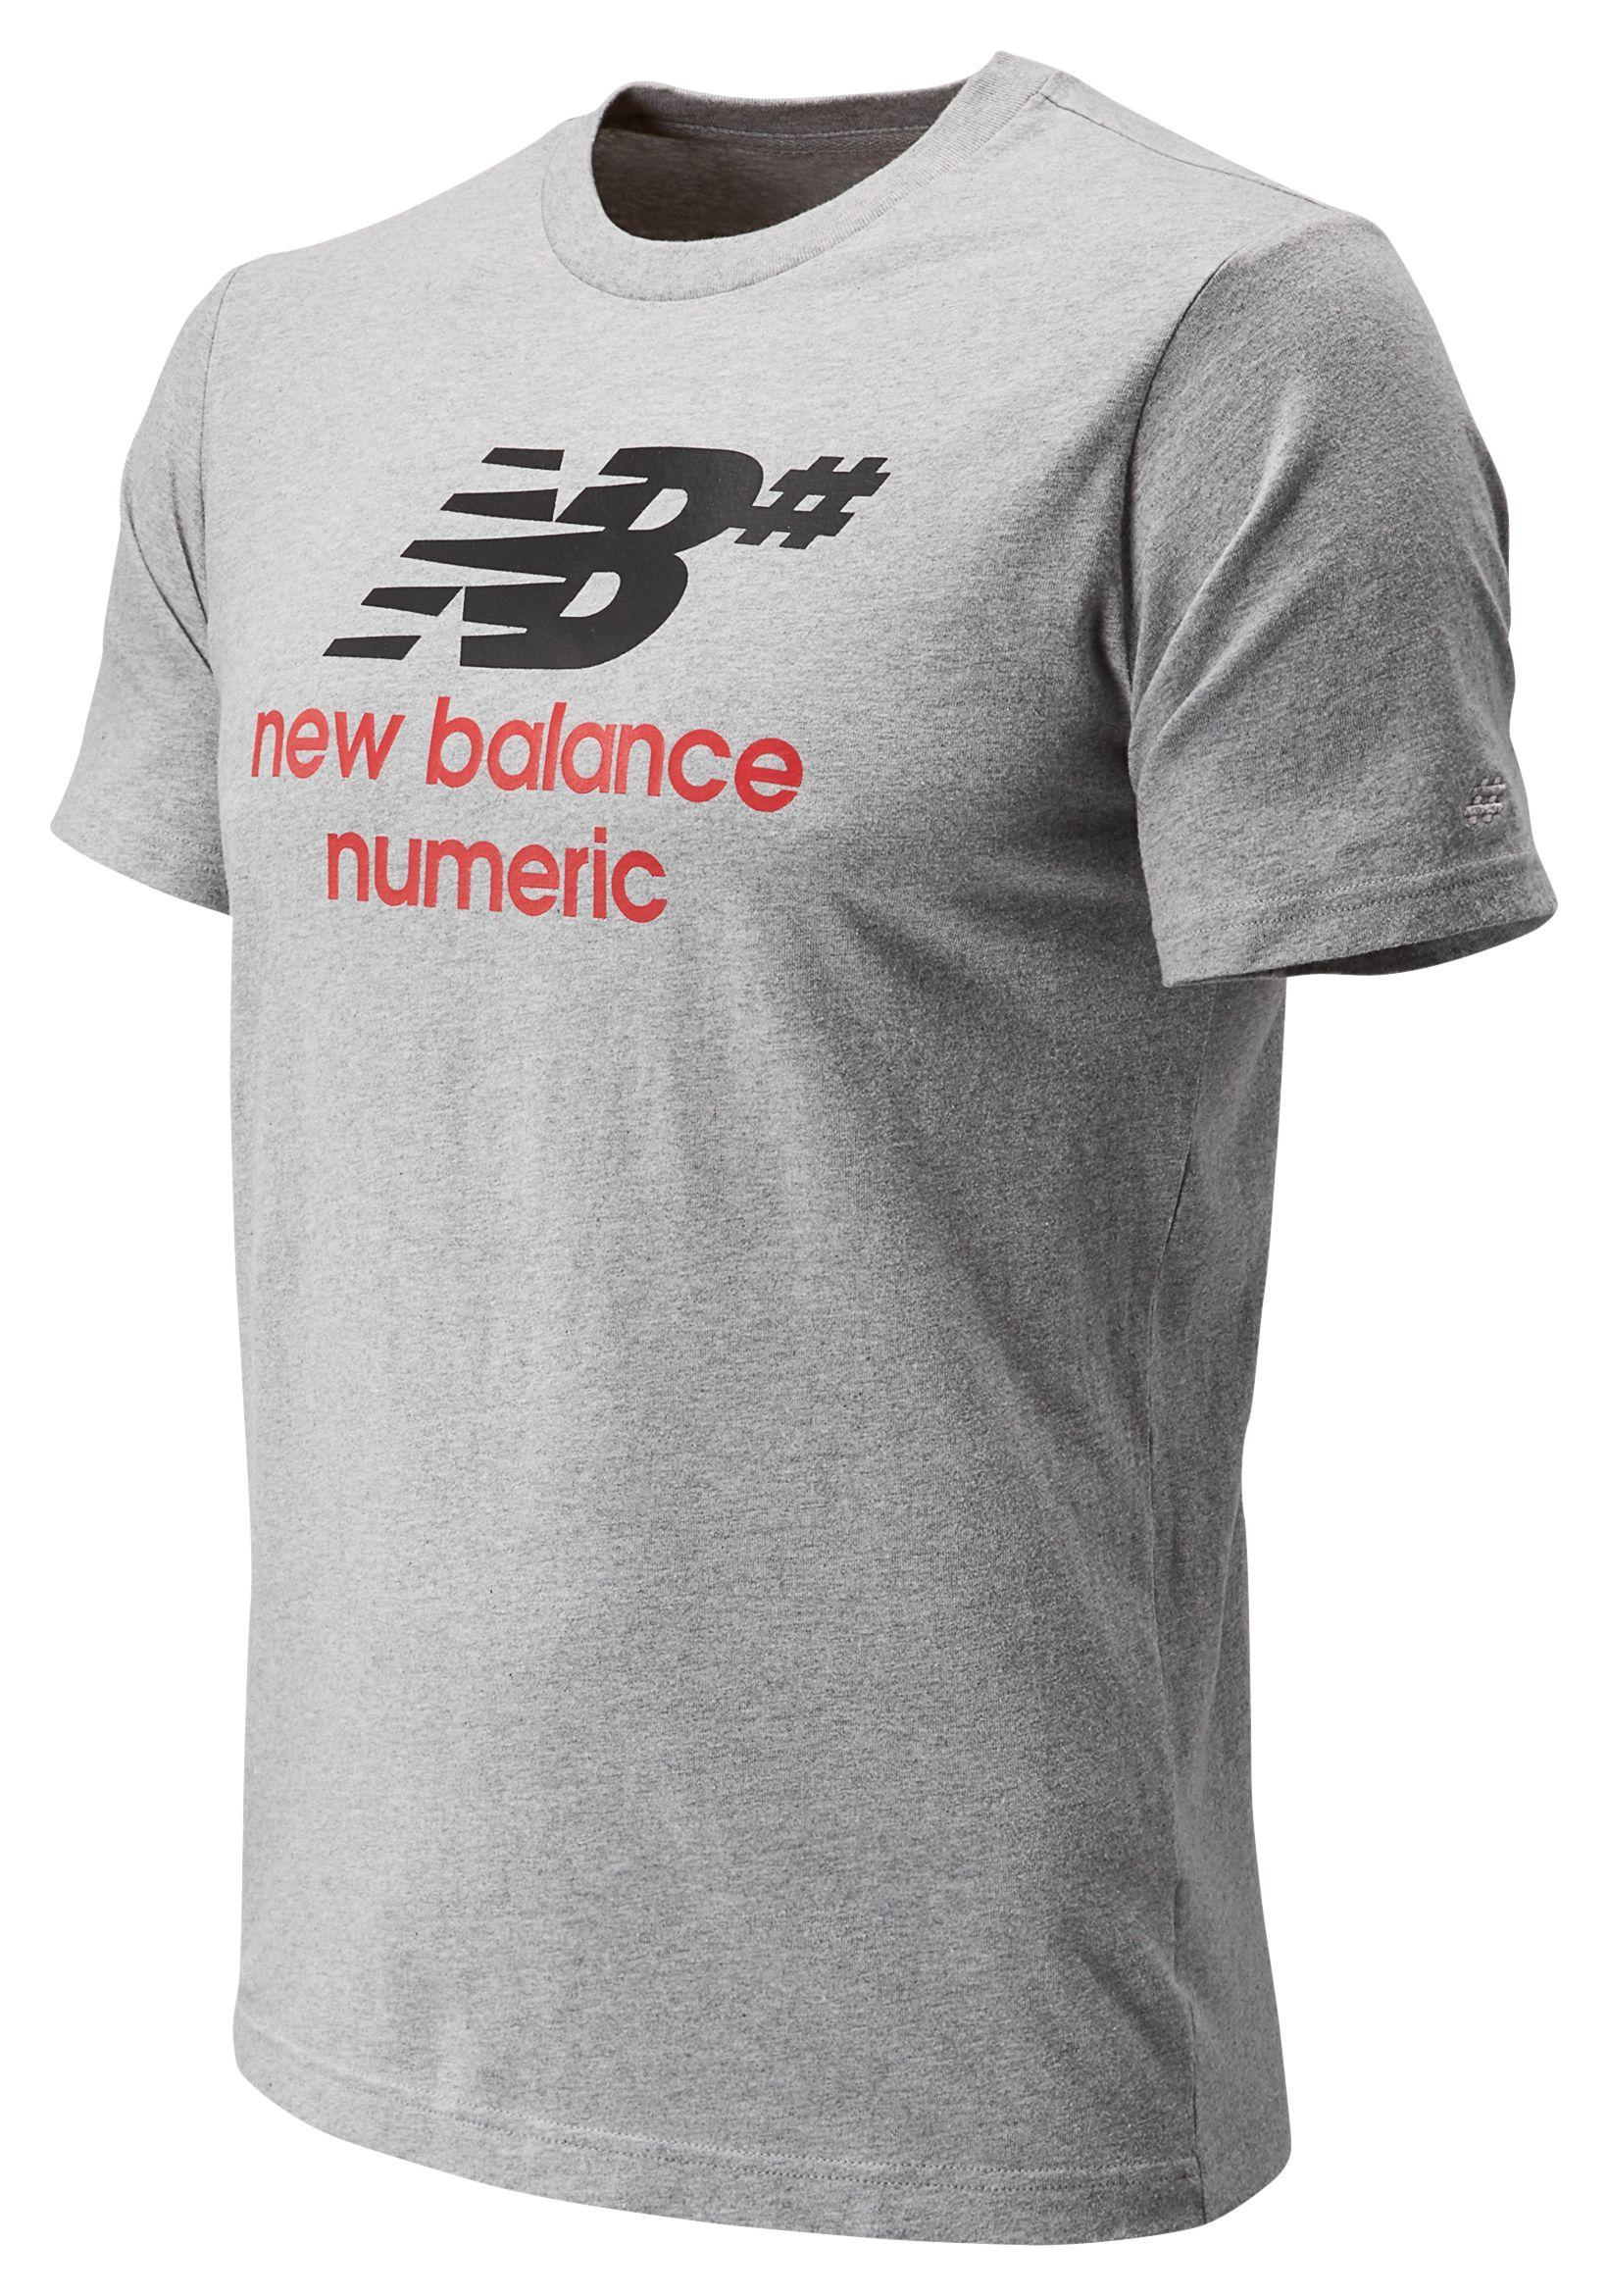 Men's Numeric Stacked Short Sleeve Tee